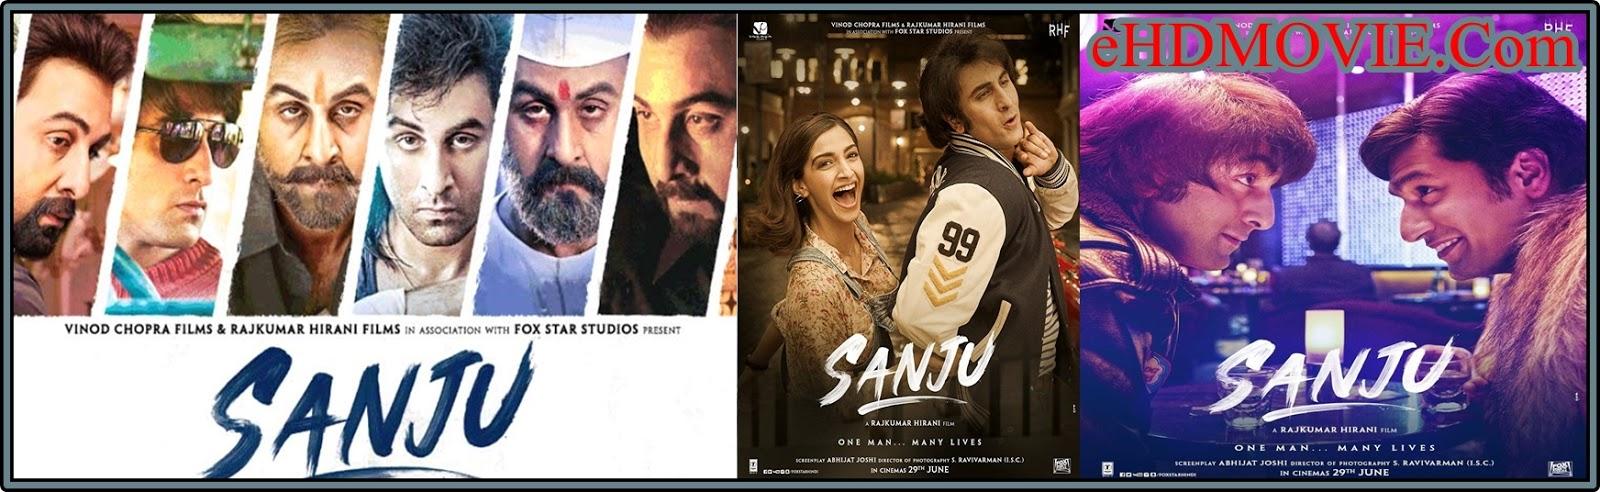 Sanju 2018 Full Movie Hindi 1080p – 720p – HEVC – 480p ORG WEB-DL 200MB - 450MB – 700MB – 1.4GB – 2.4GB ESubs Free Download